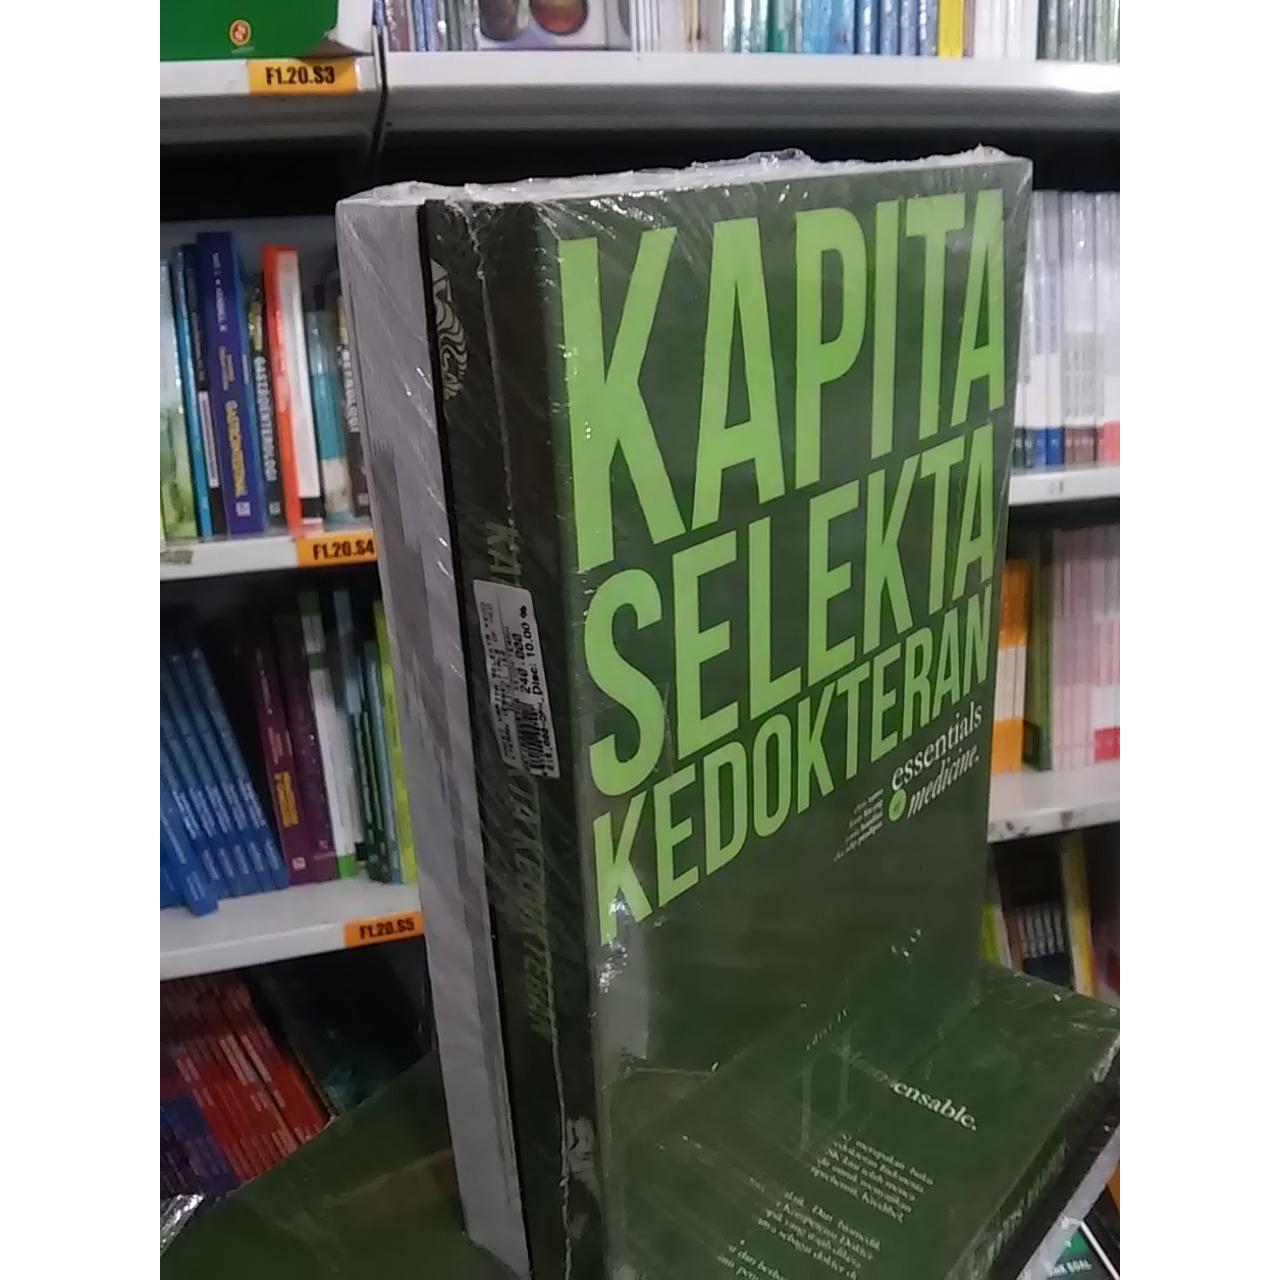 Buku Kapita Selekta Kedokteran Jilid I & II Edisi IV - 2